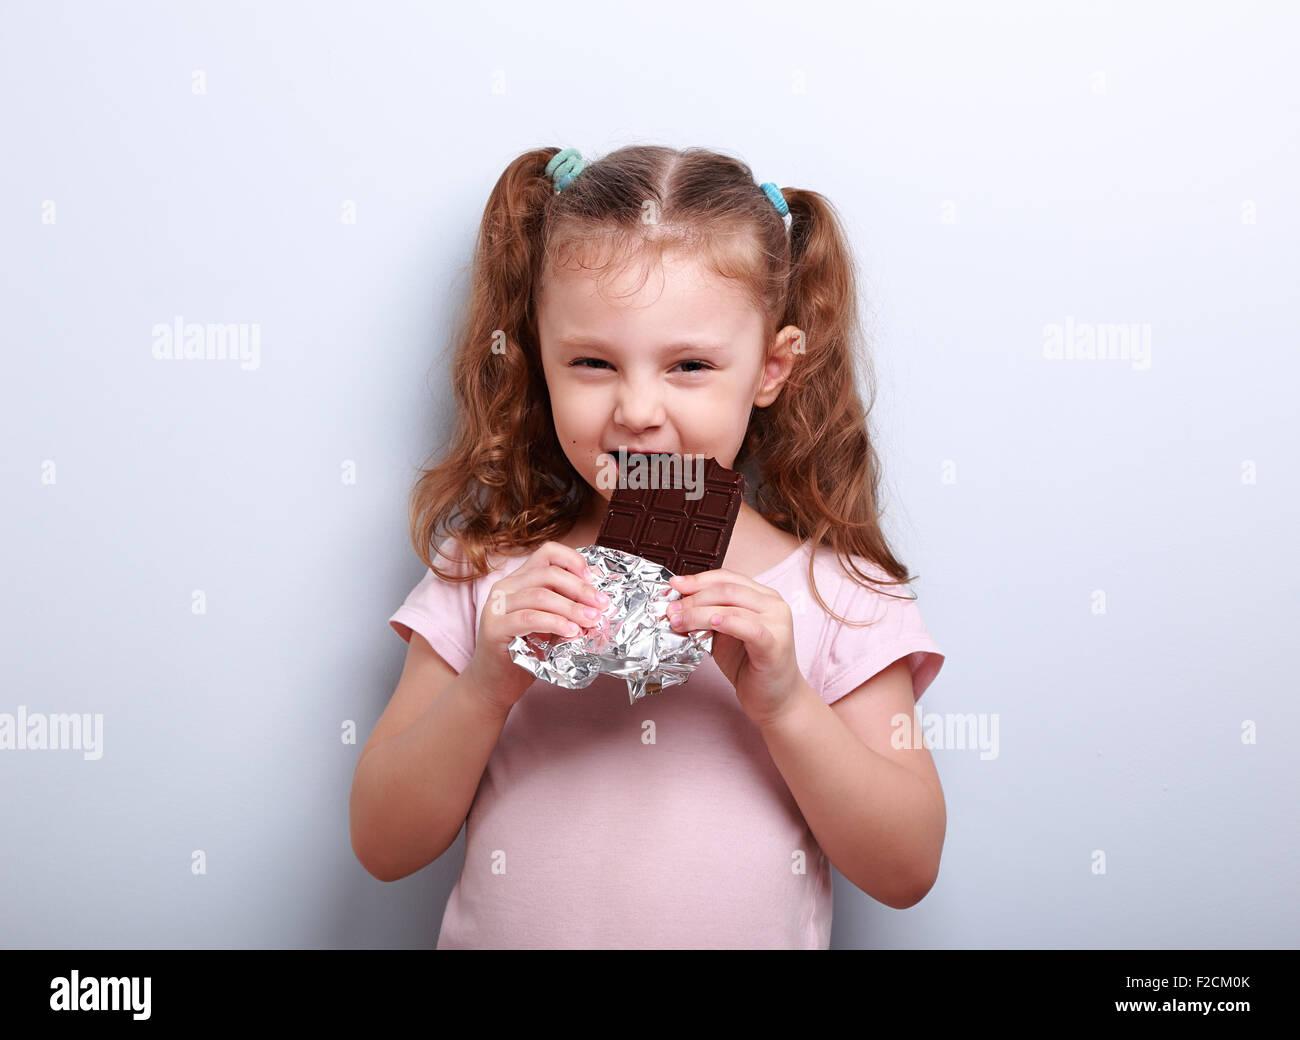 Astucia divertido chico chica comiendo chocolate oscuro con mirada curiosa sobre fondo azul. Imagen De Stock